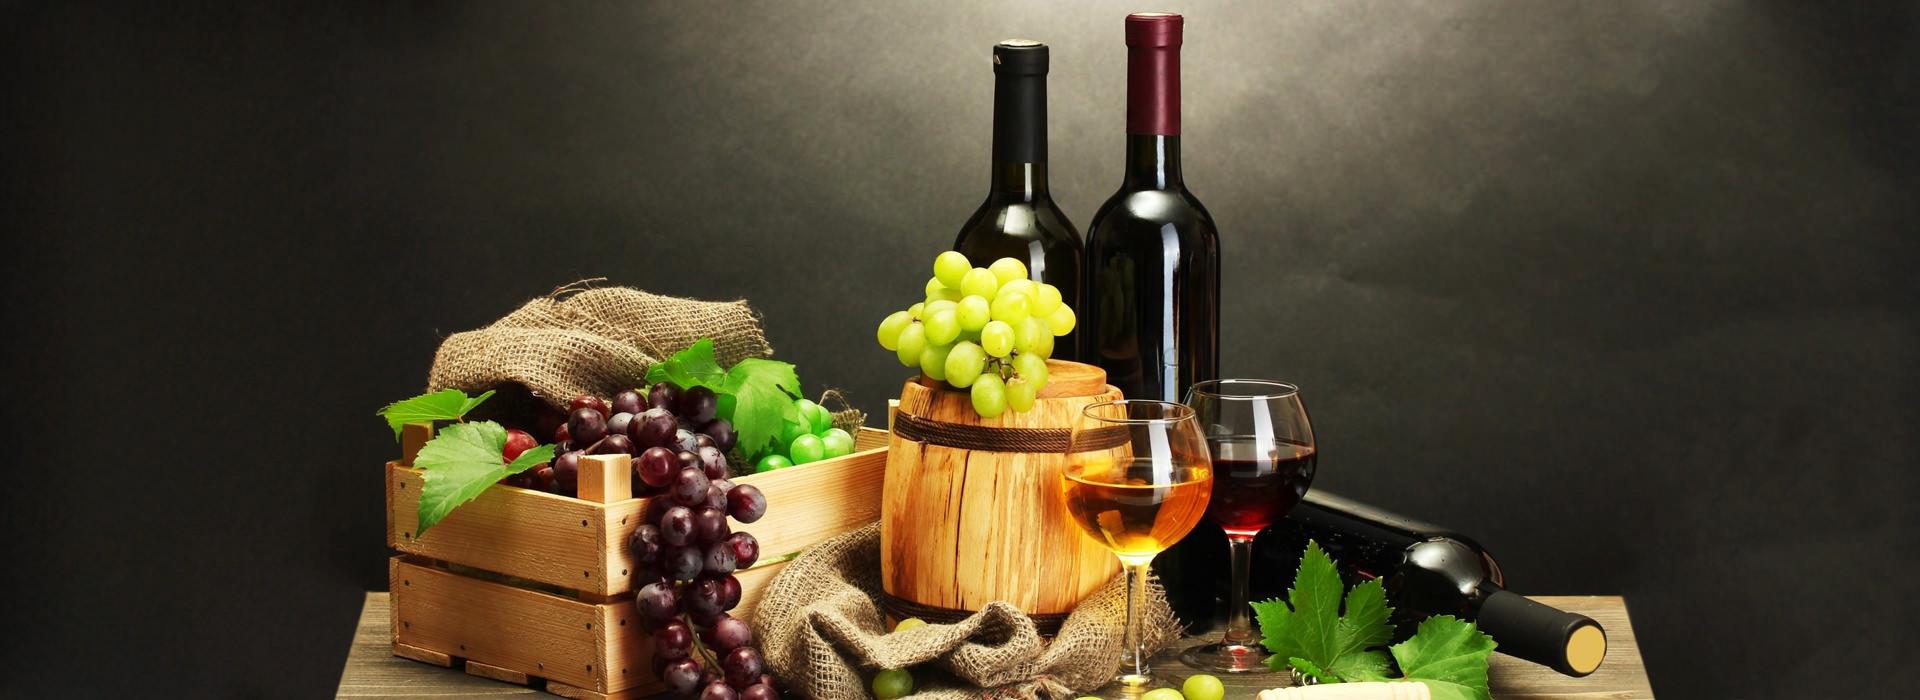 vino_2